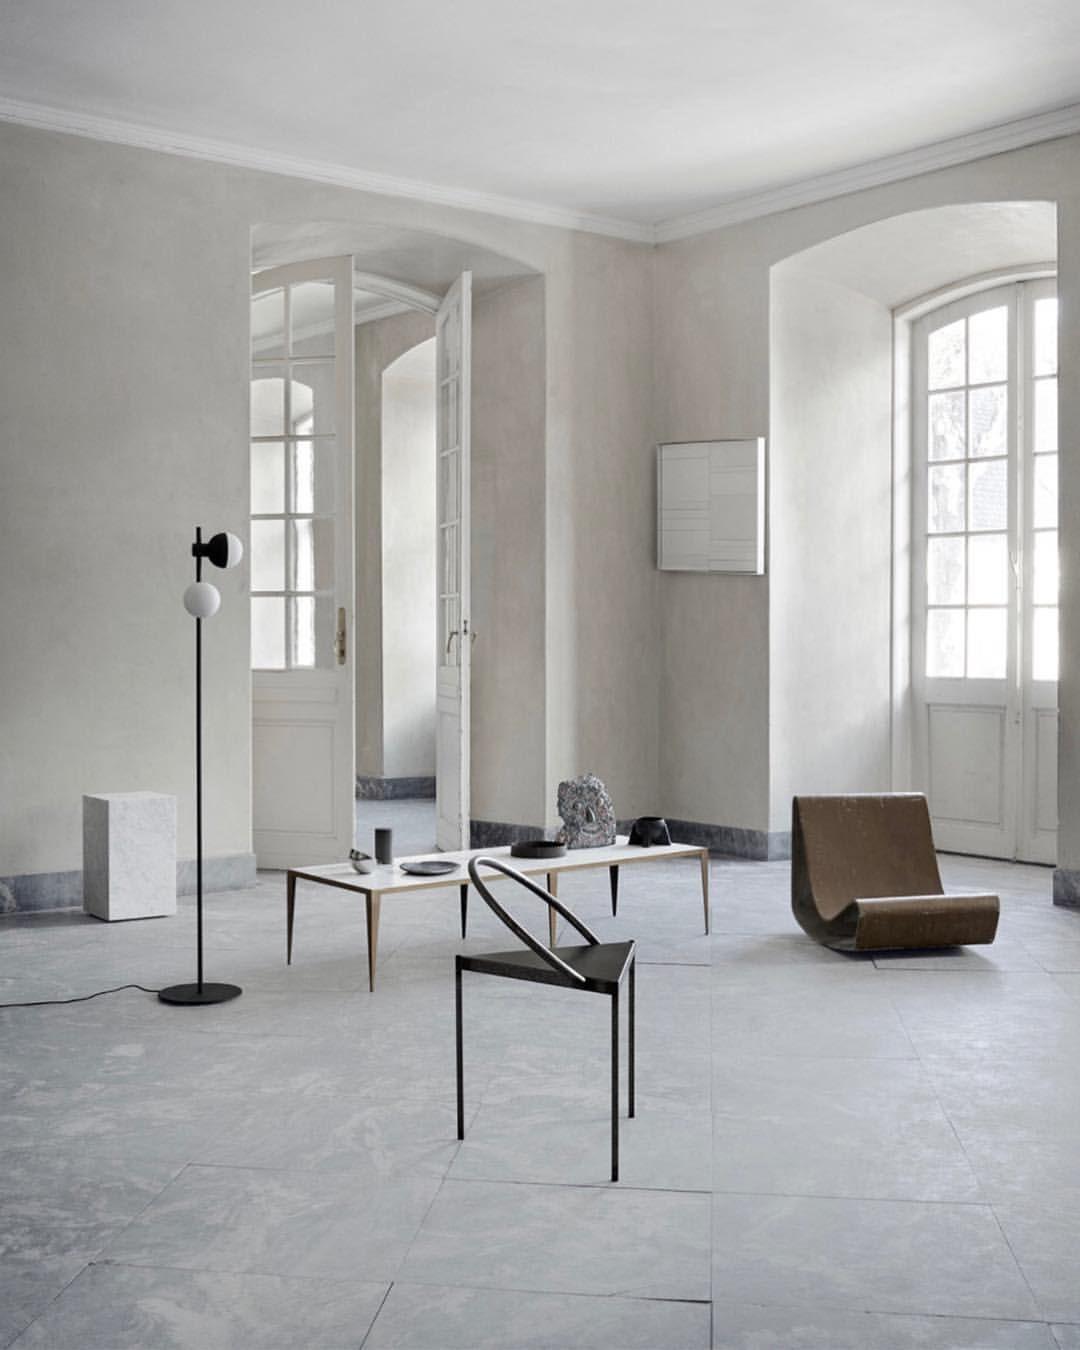 Chair As Sculptur Interior Minimalist Home Interior Interior Design